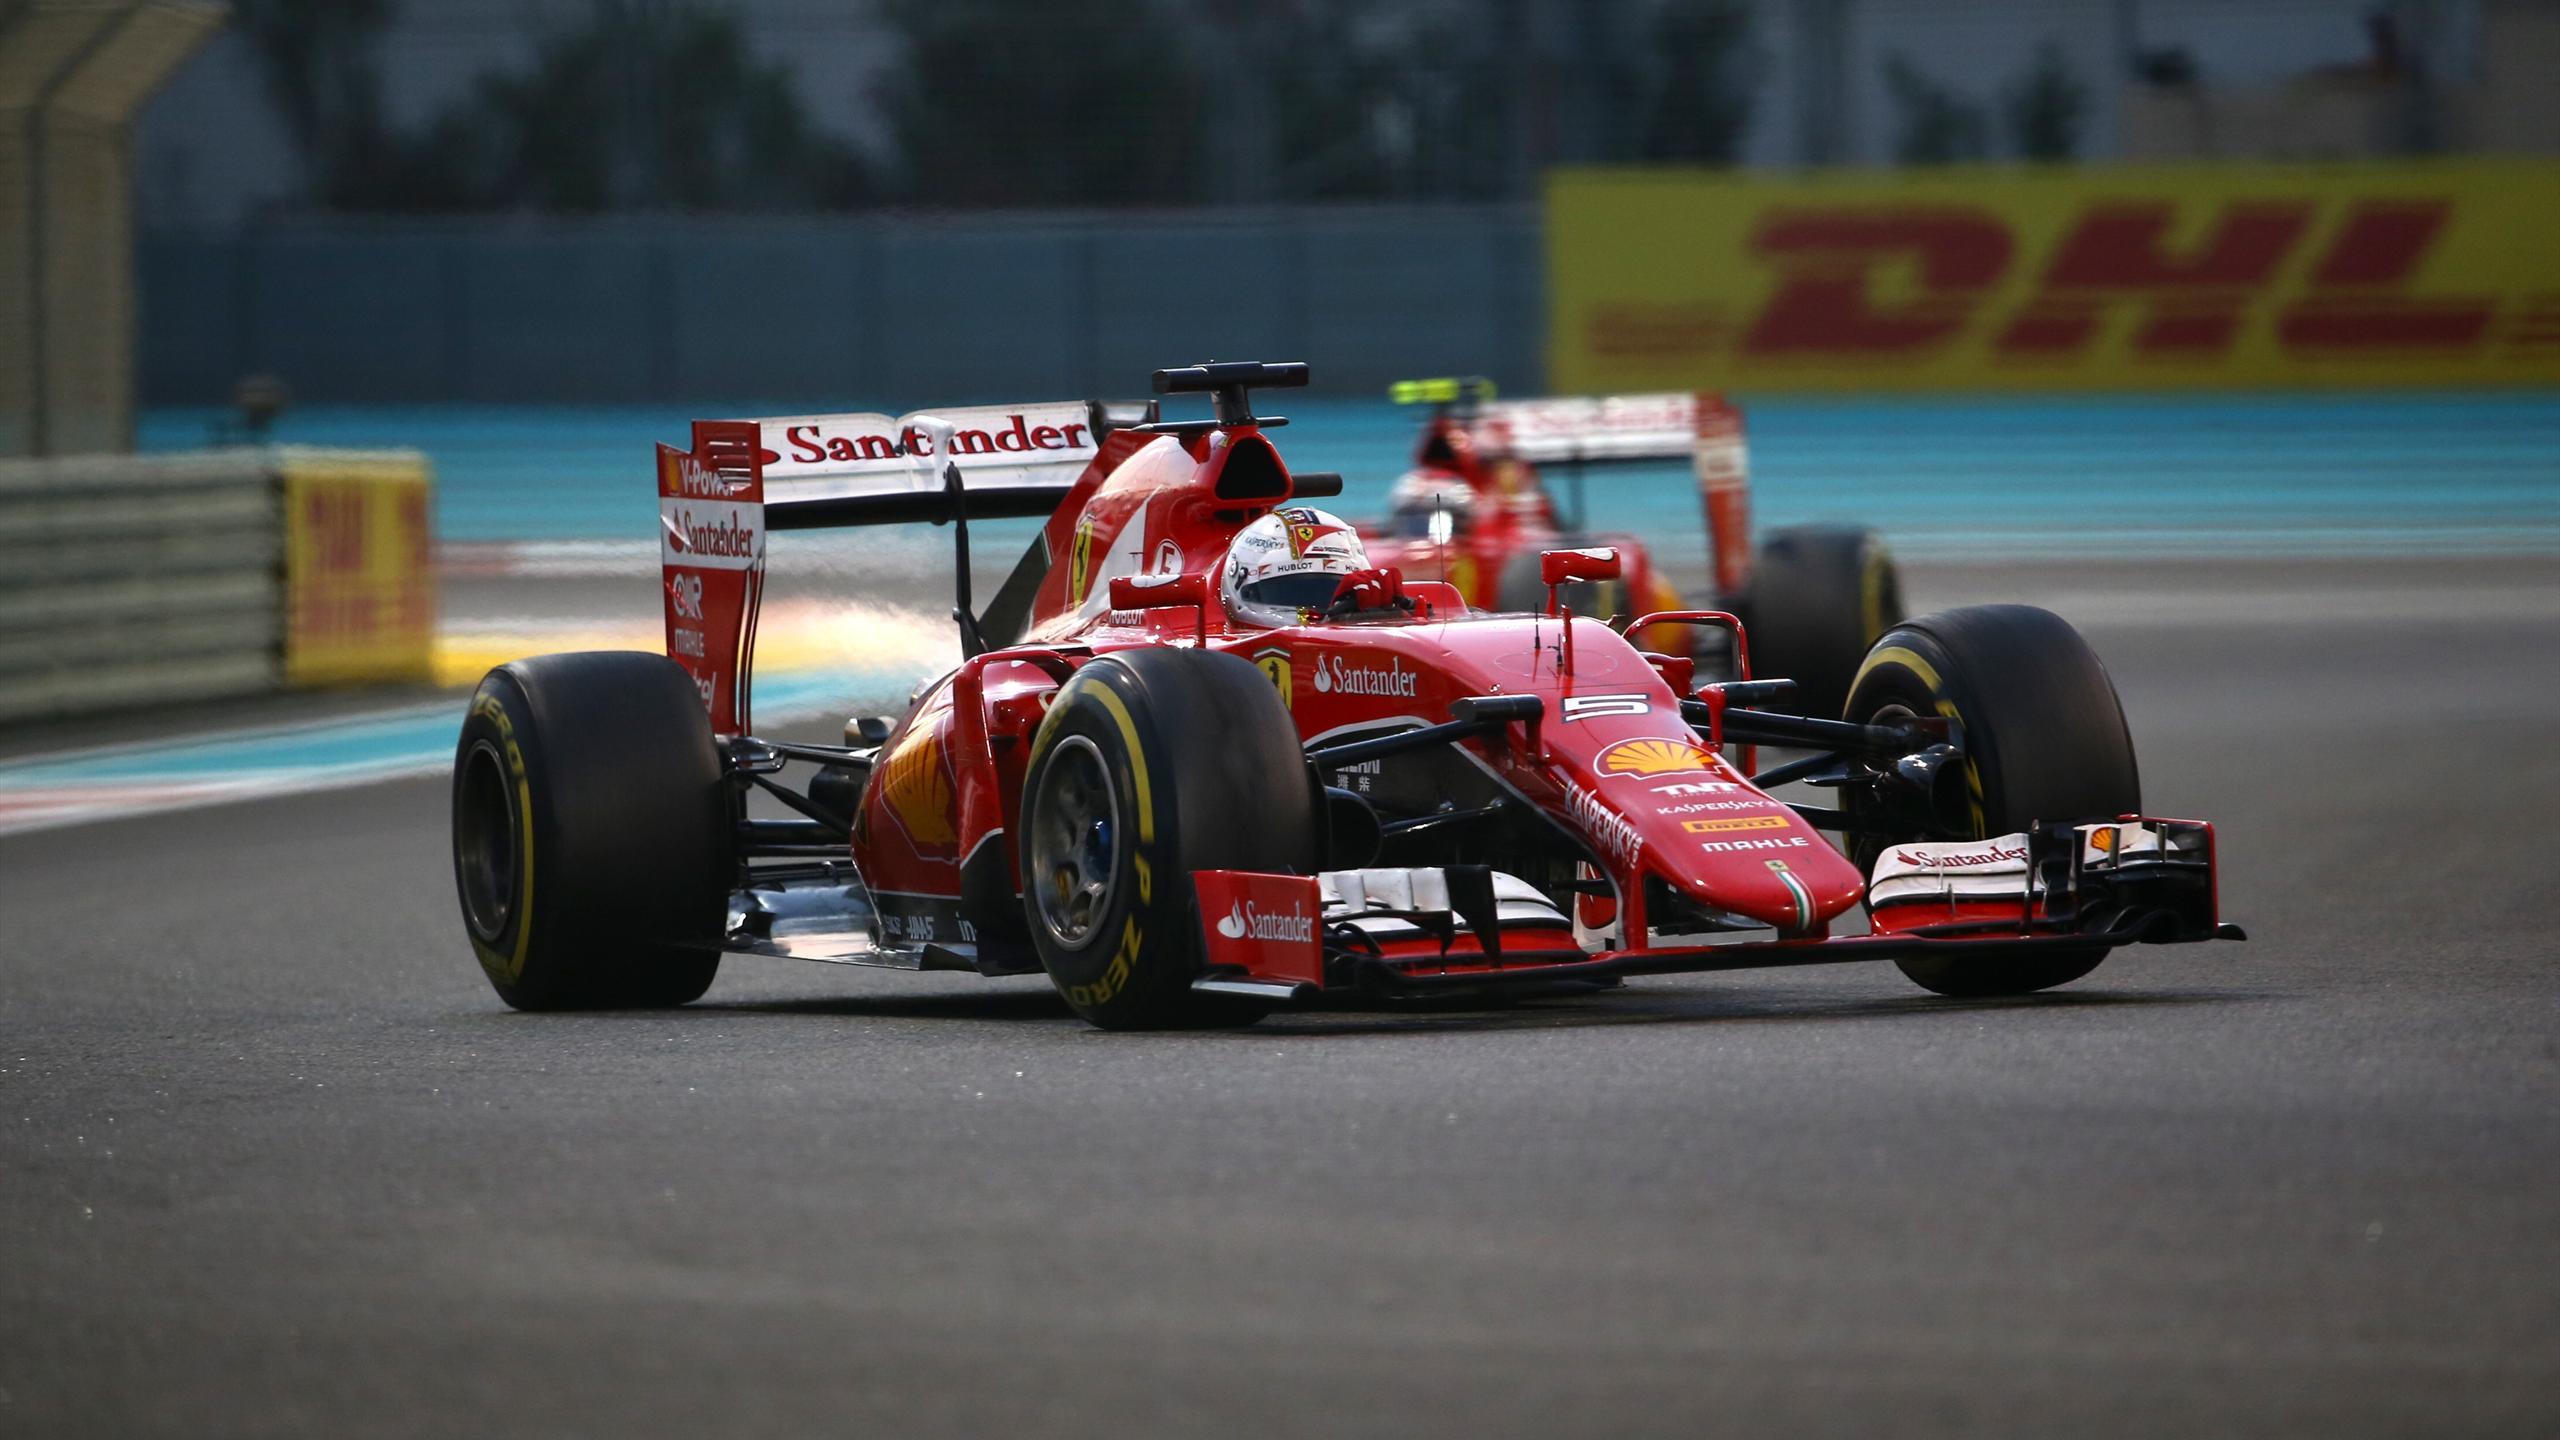 Sebastian Vettel (Ferrari) devant son coéquipier Kimi Raïkkönen durant le Grand Prix d'Abou Dabi 2015